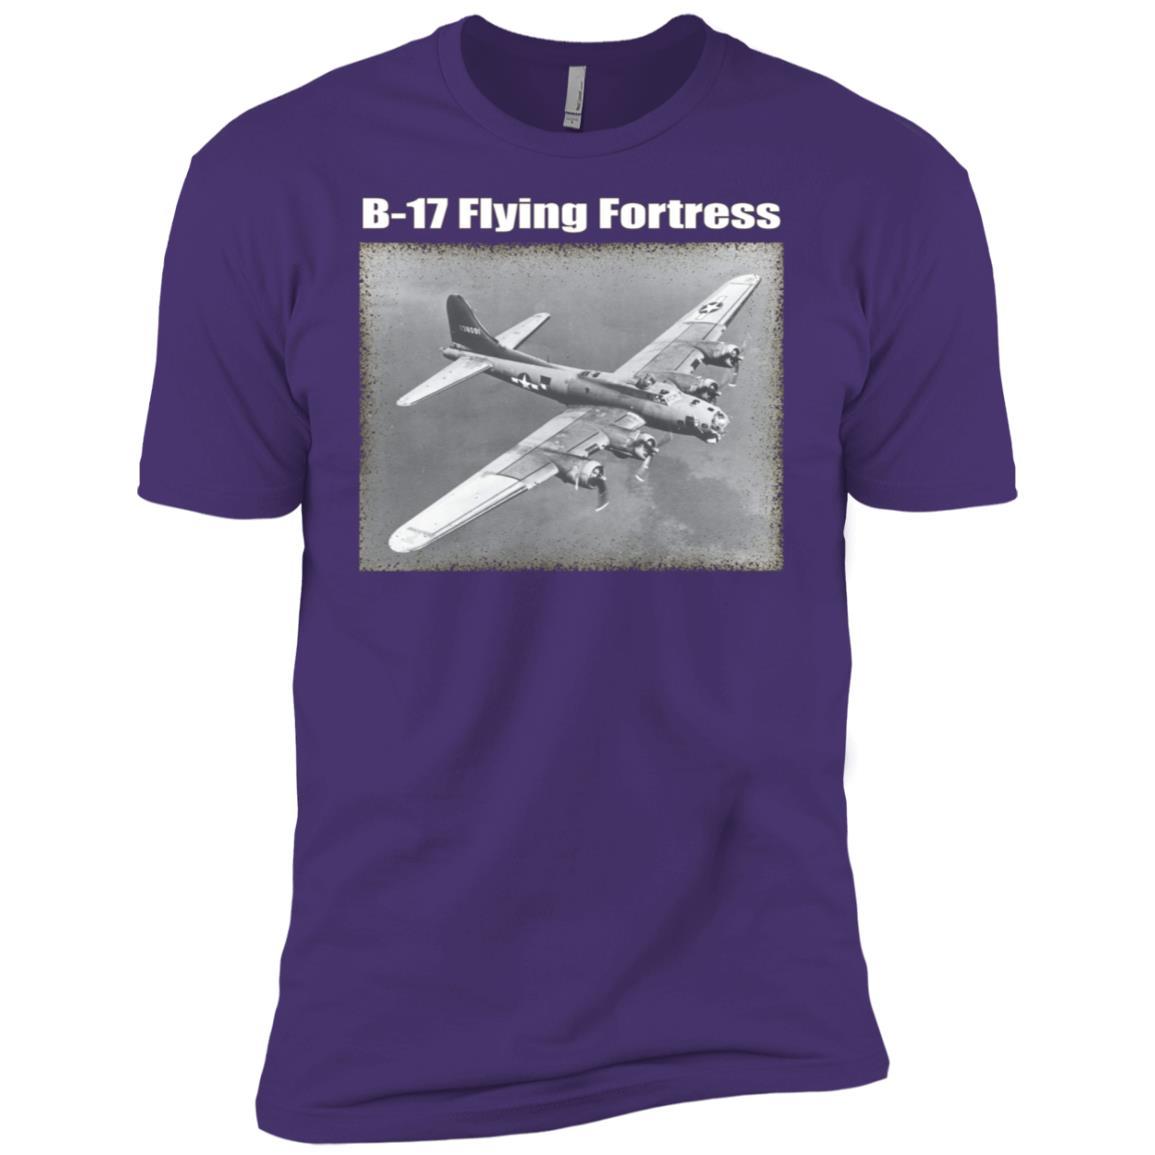 B-17 Flying Fortress Men Short Sleeve T-Shirt